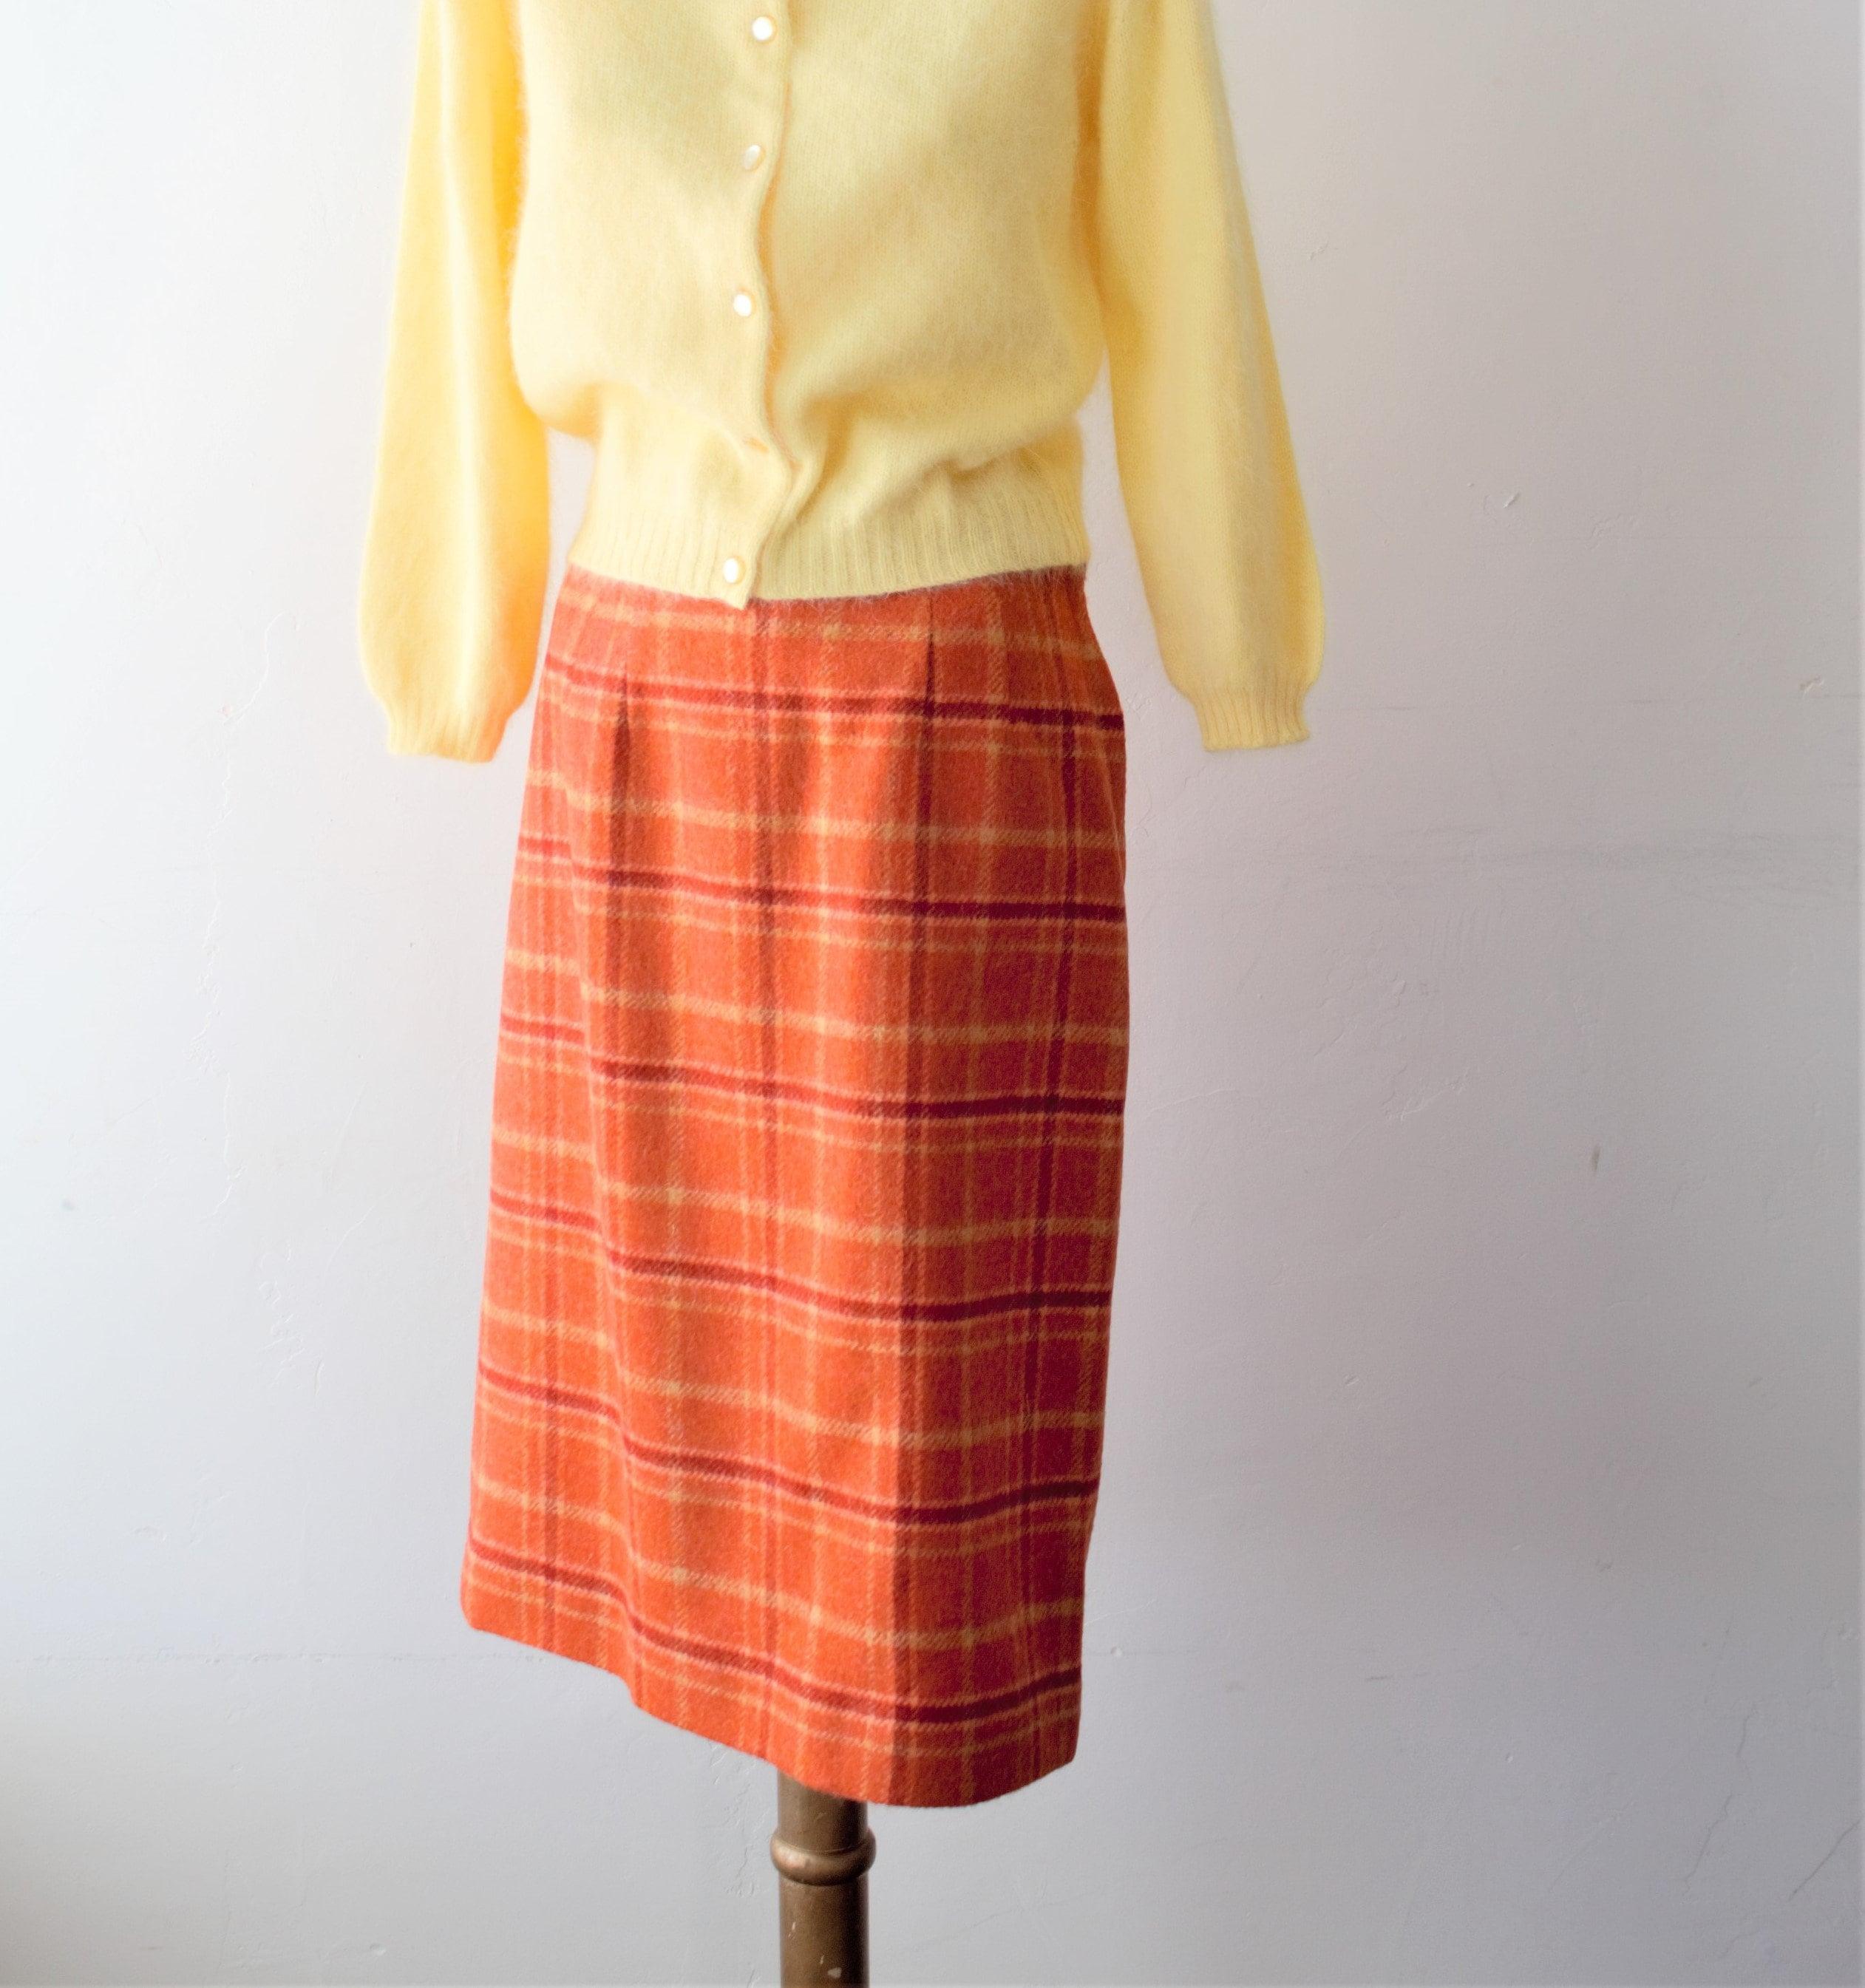 Vintage Scarf Styles -1920s to 1960s Save 50 Now Plaid Skirt Burnt Orange Dress High Waisted Wool Midi 60S Mod Fitte $67.00 AT vintagedancer.com